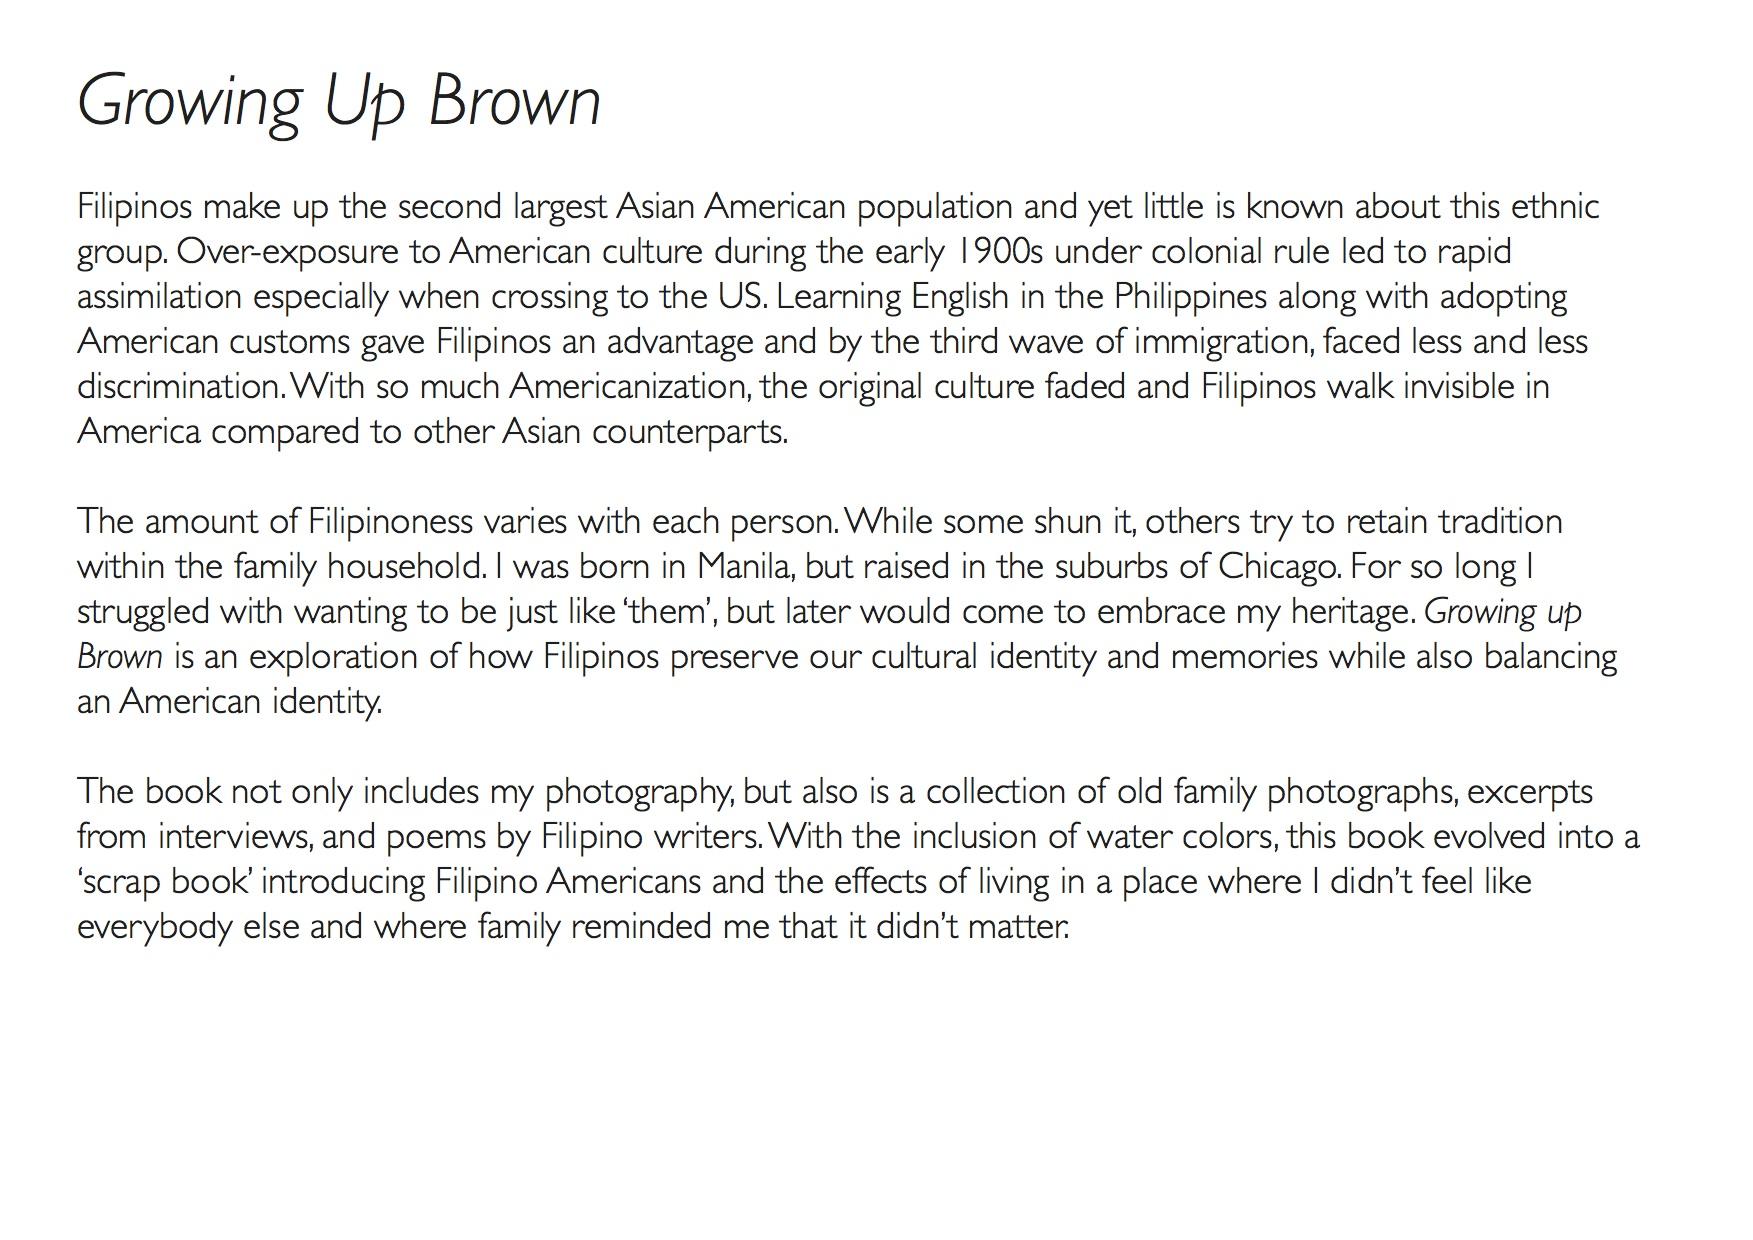 Growing up Brown text copy.jpg